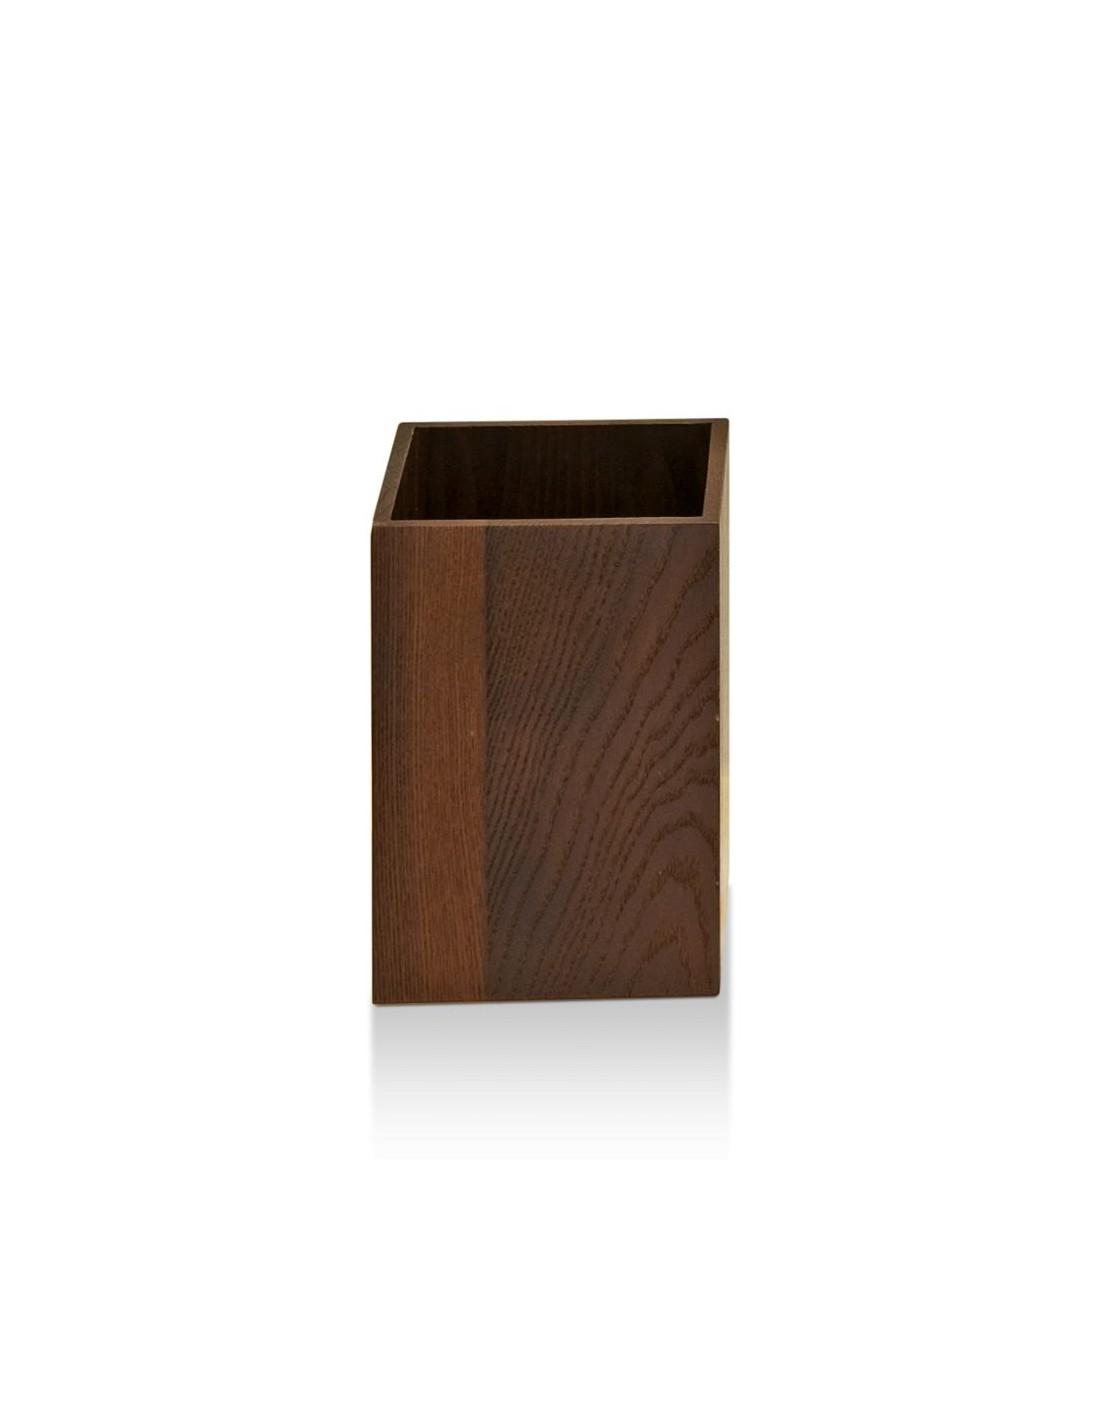 corbeille papier en bois massif wood wo pk en fr ne thermo huil fonc decor walther. Black Bedroom Furniture Sets. Home Design Ideas